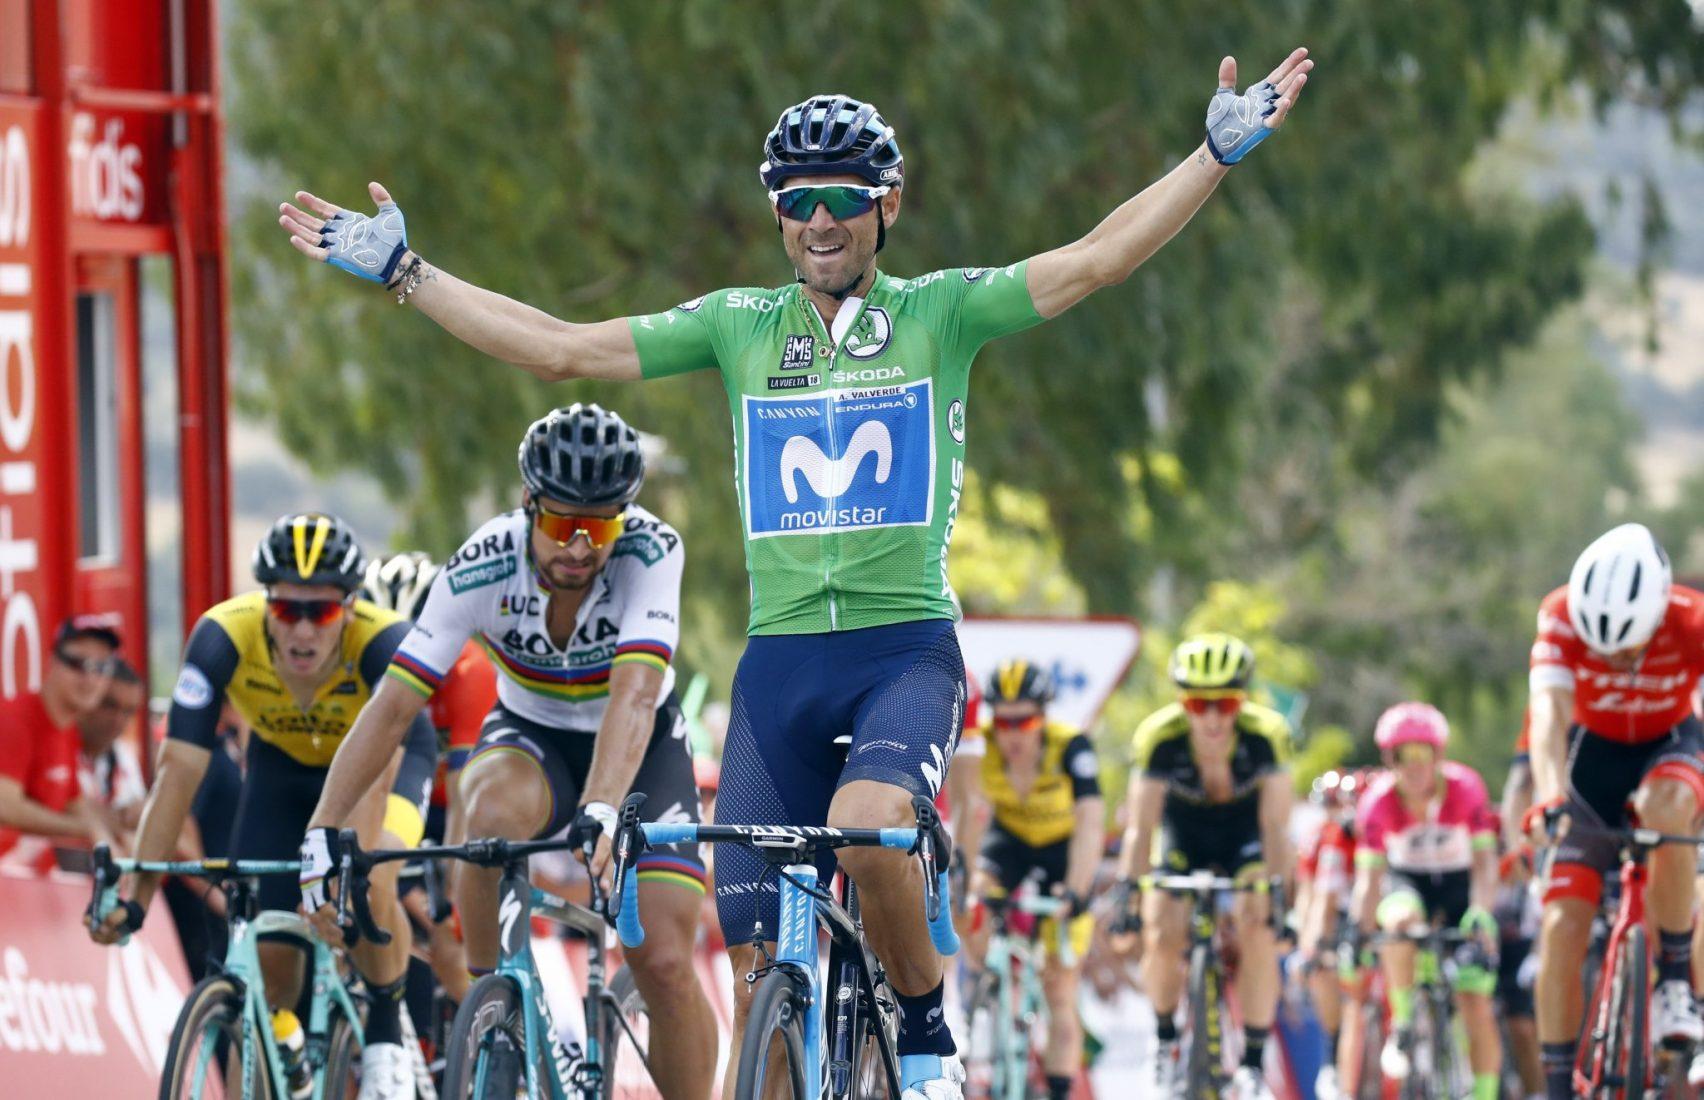 Vuelta 2018: Valverde batte Sagan allo sprint